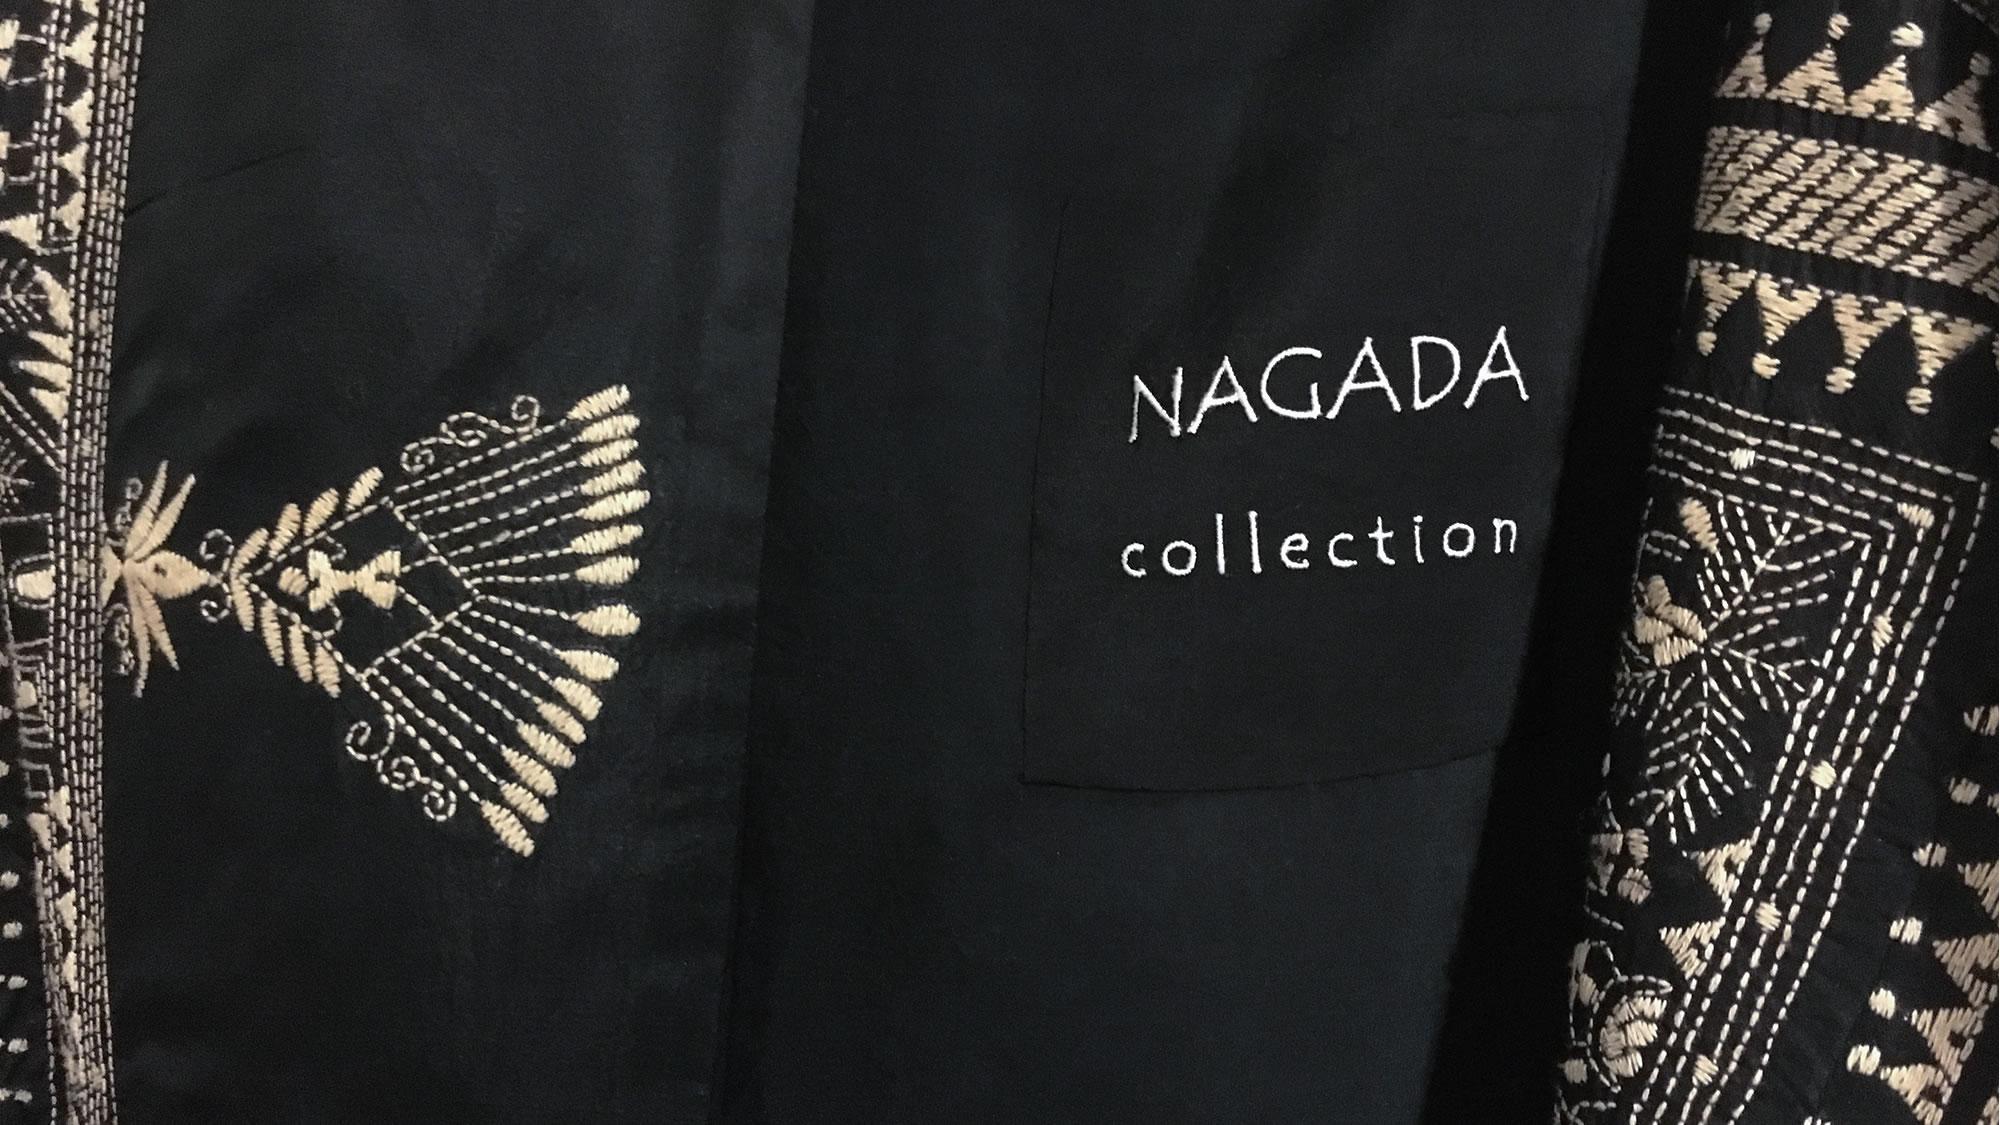 NAGADA-collection-fashion-cairo-01+.jpg